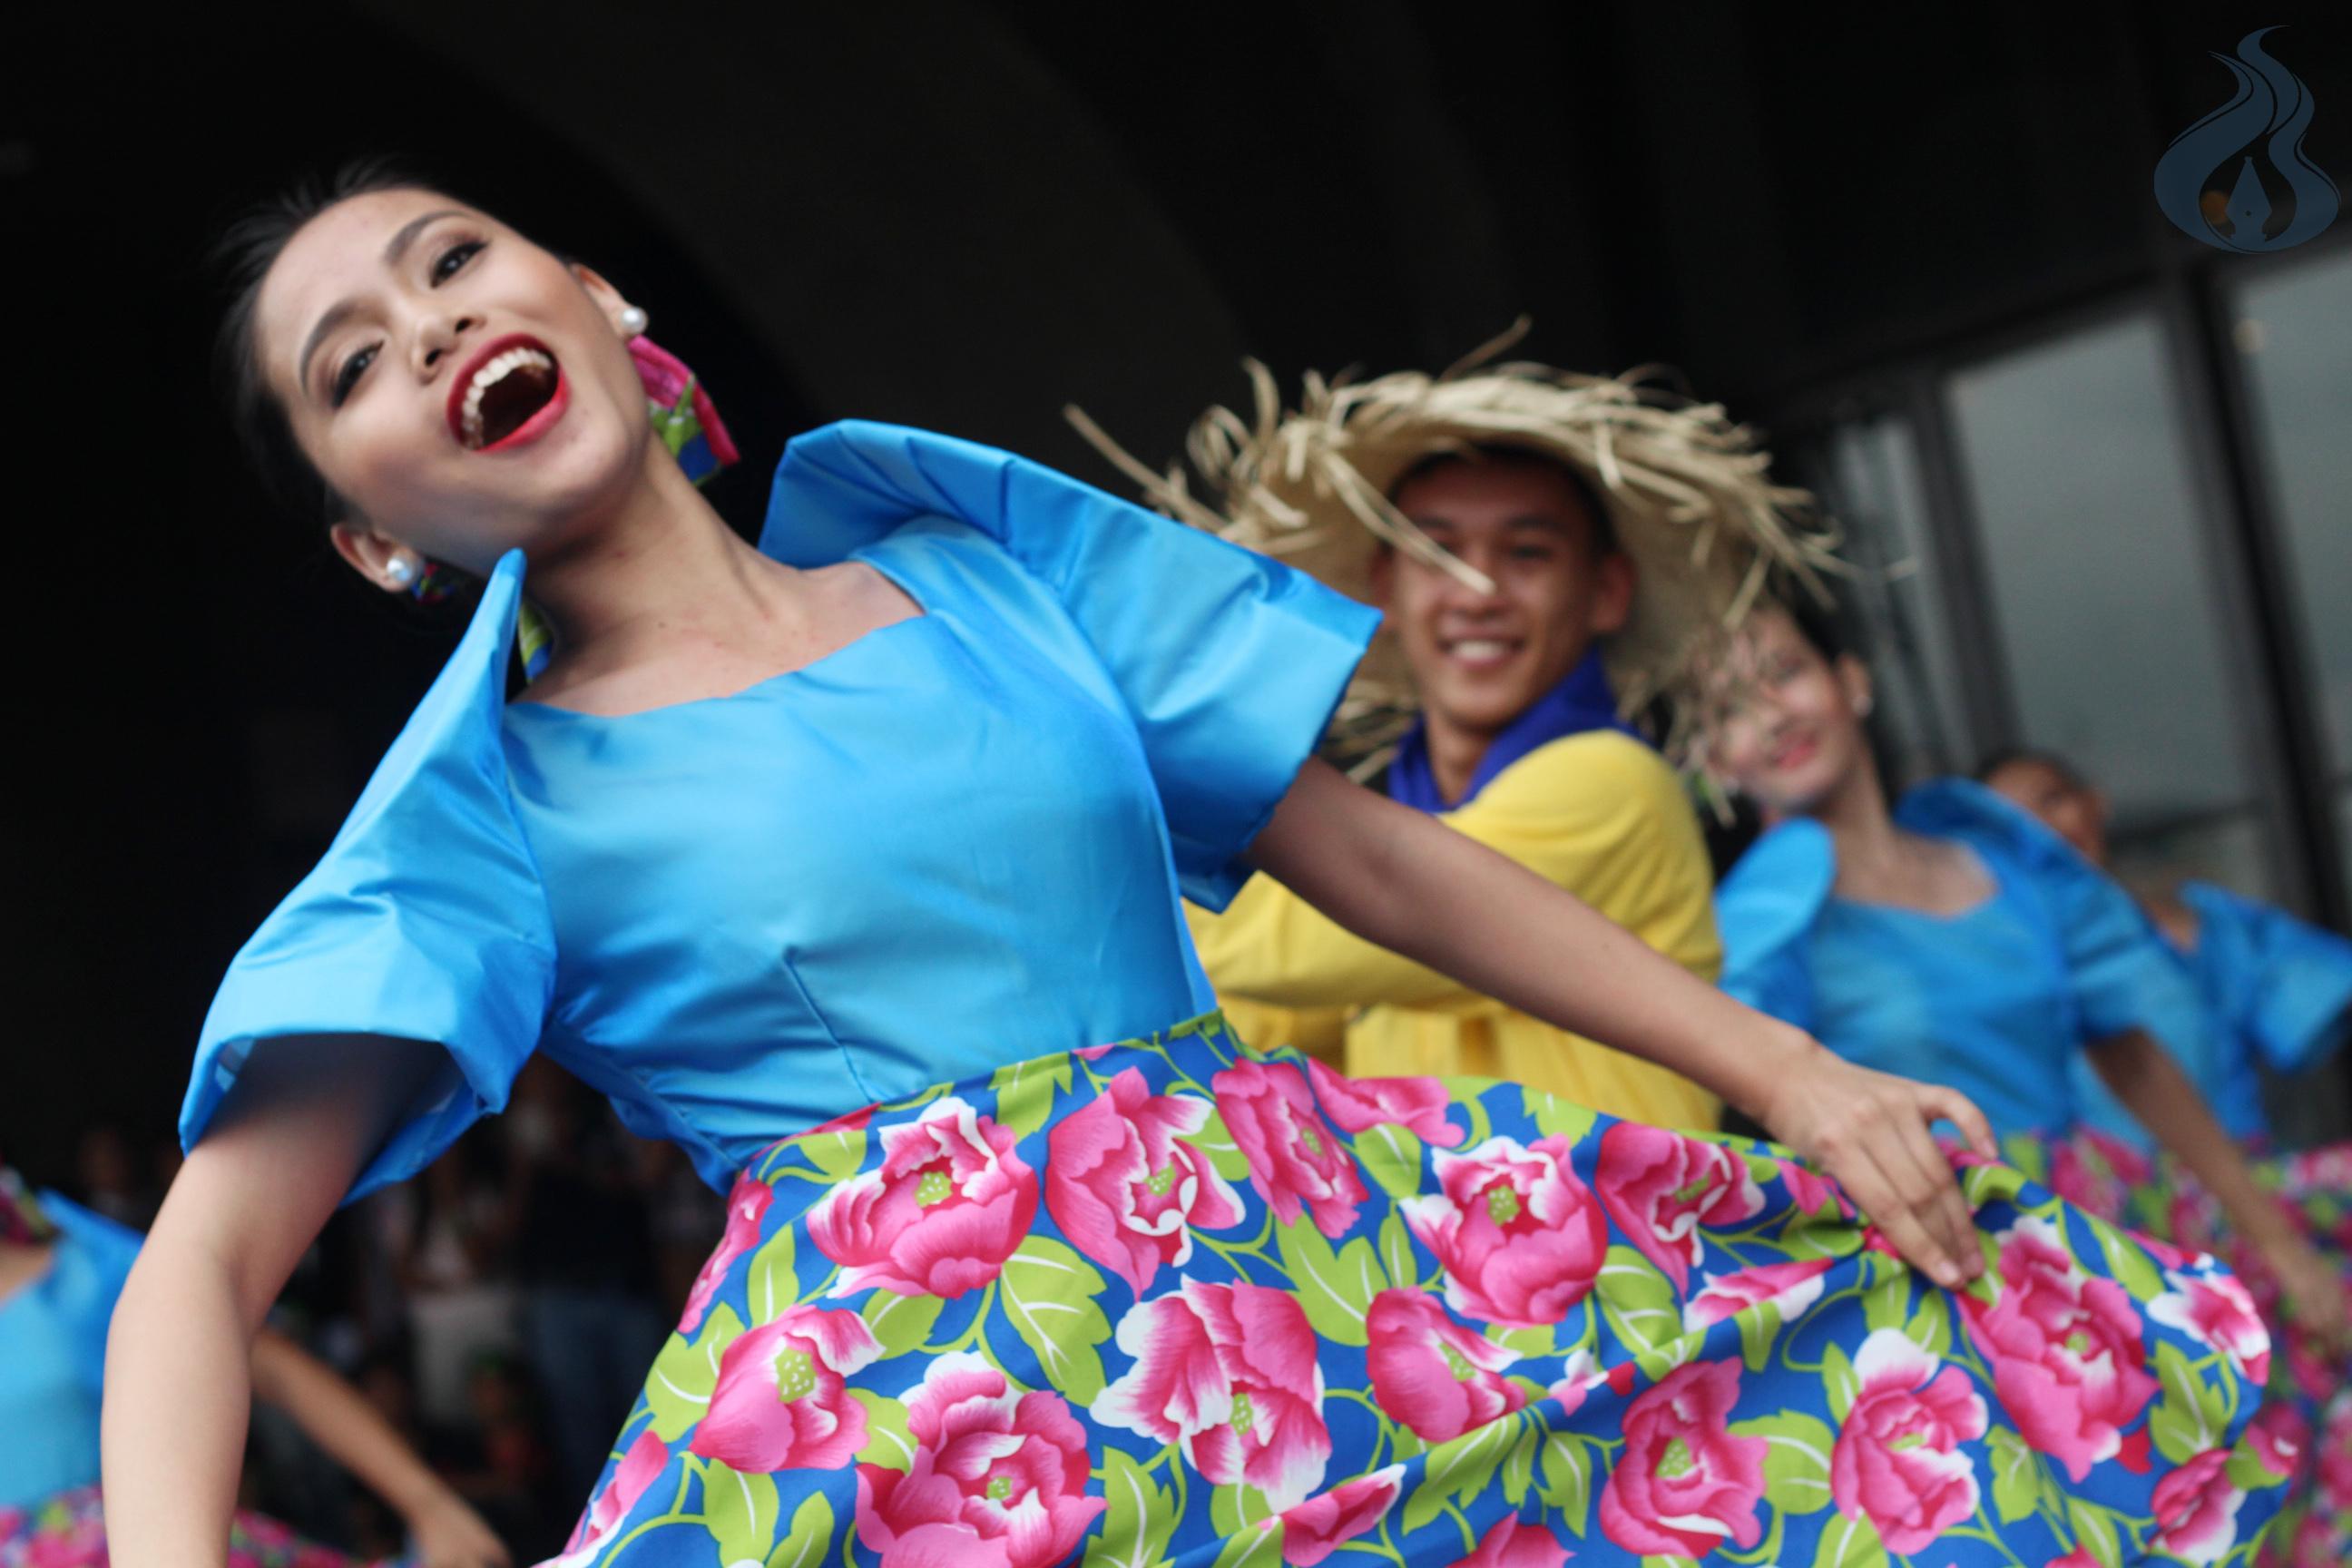 6 Takeaways From This Year's Pasinaya Festival